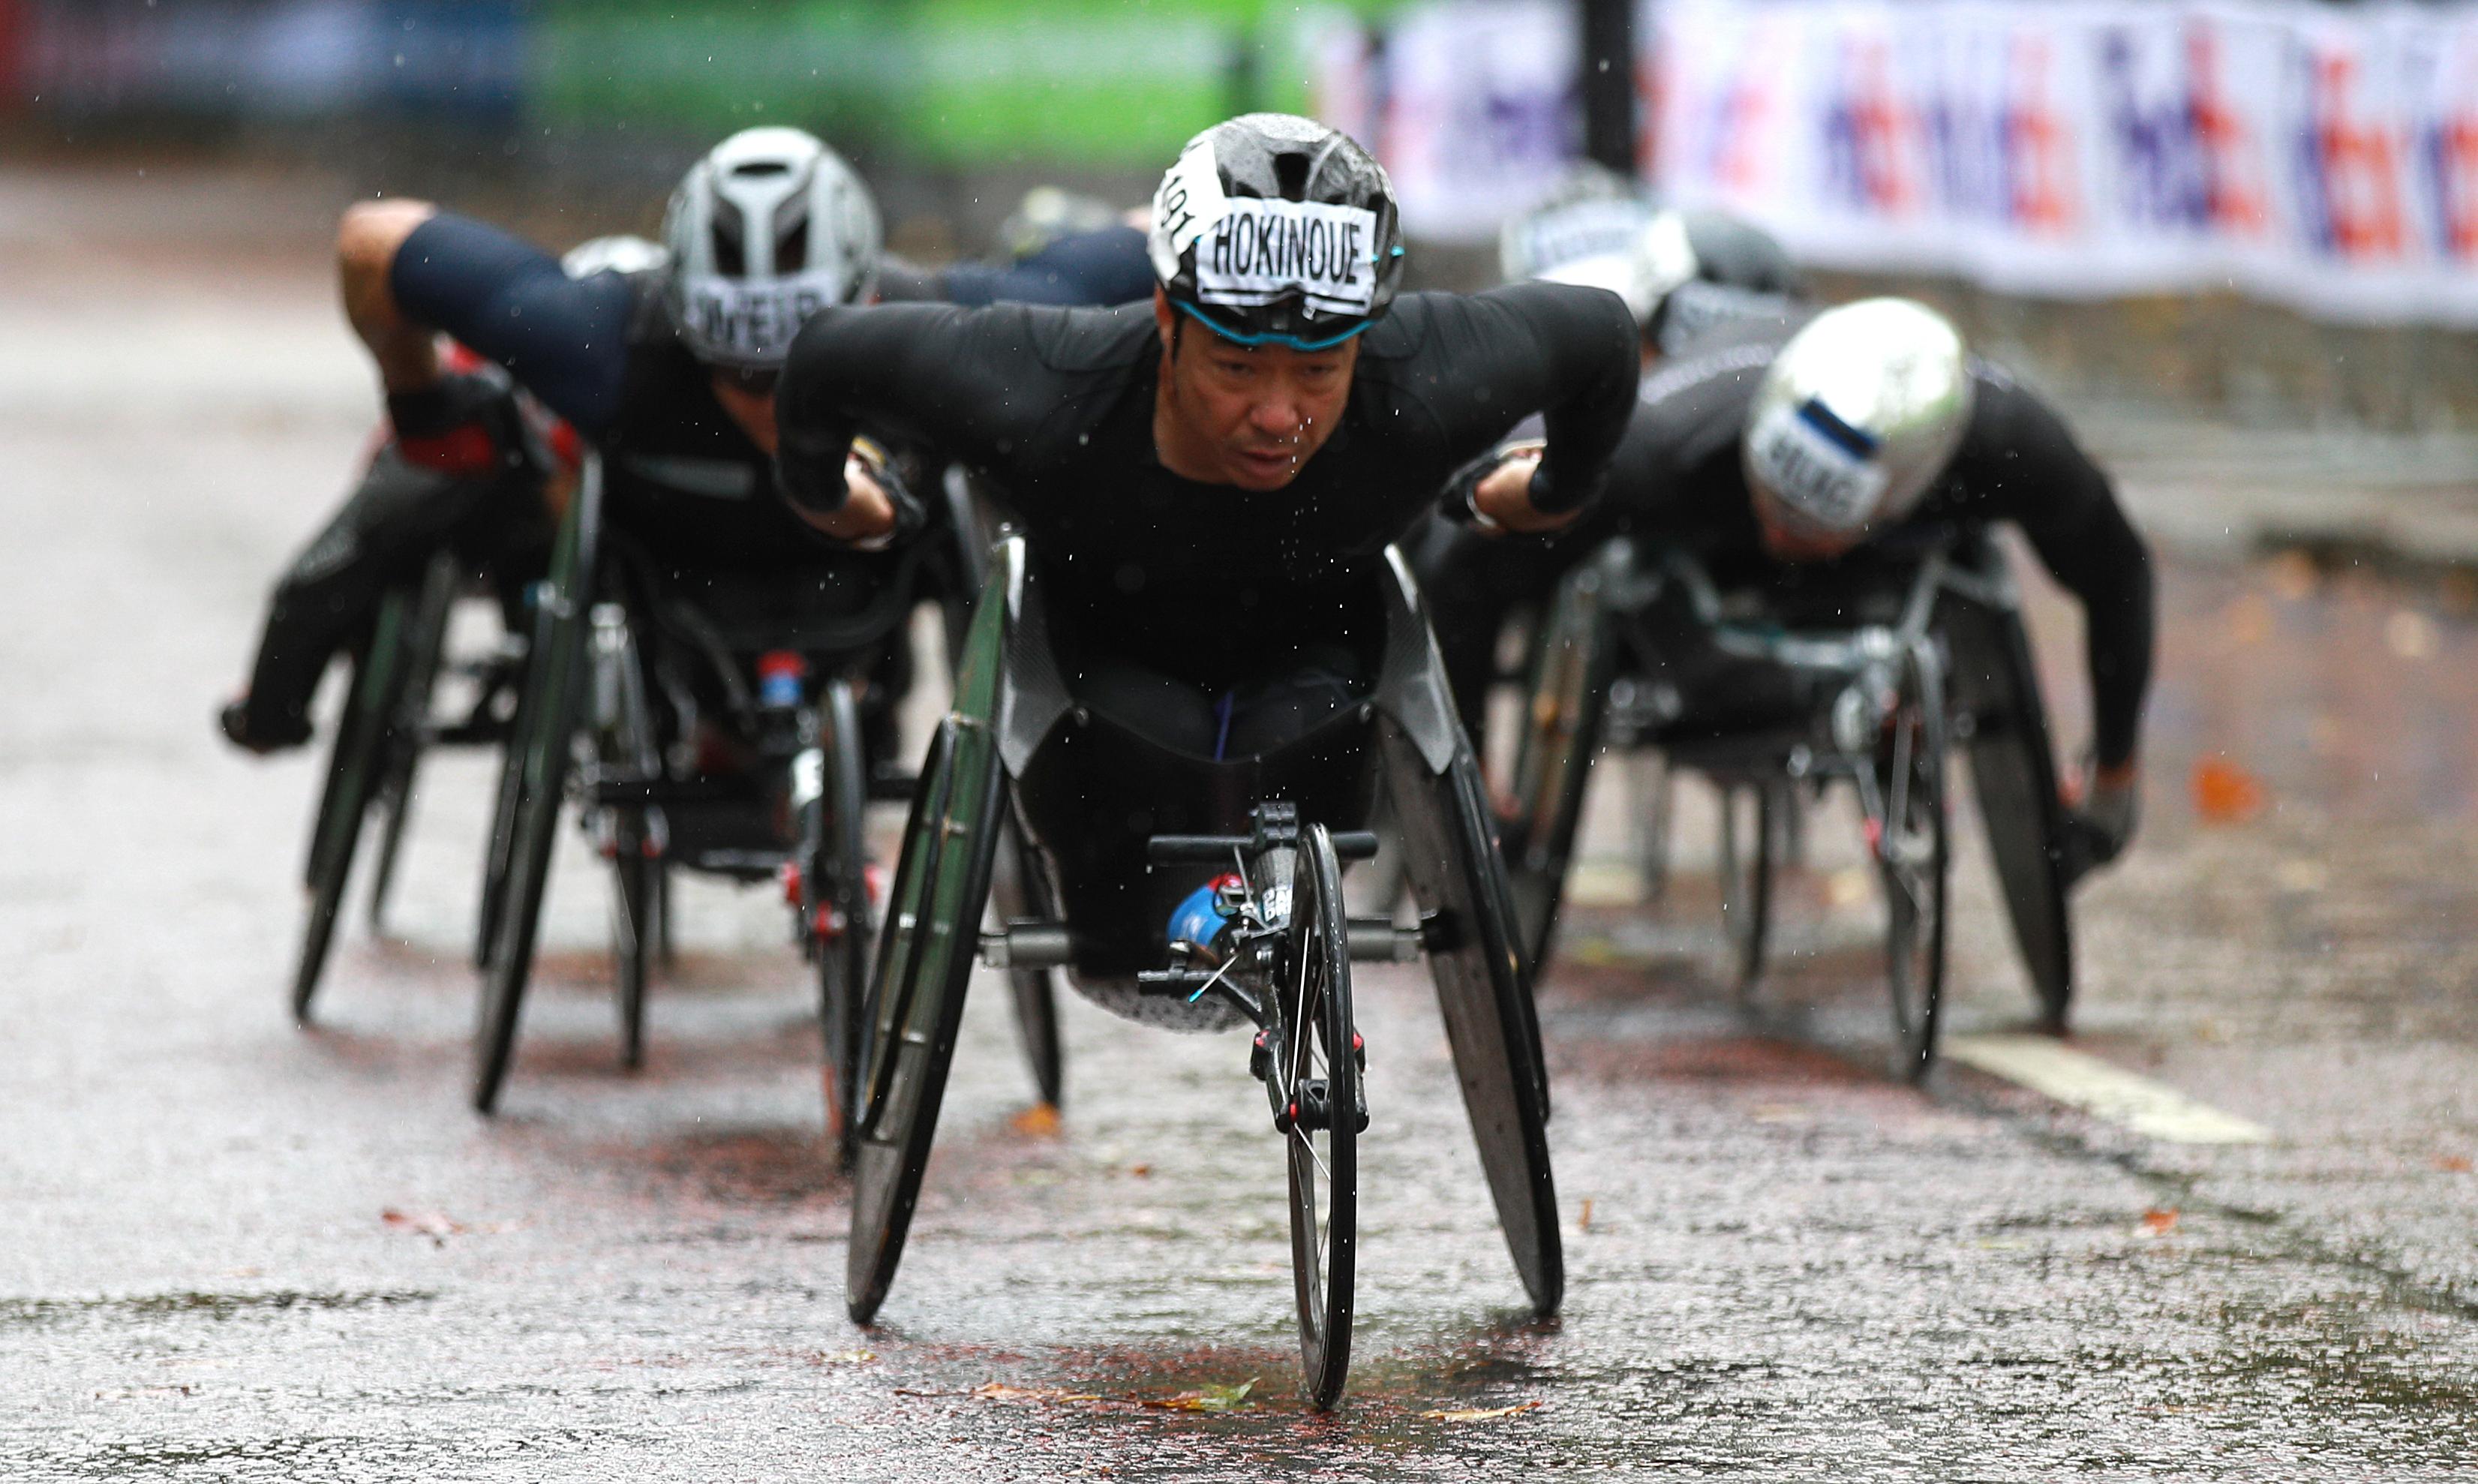 Japan's Hiroki Nishida in action during the Elite Wheelchair Race during the Virgin Money London Marathon around St James' Park. (Photo by Ian Walton/PA Images via Getty Images)